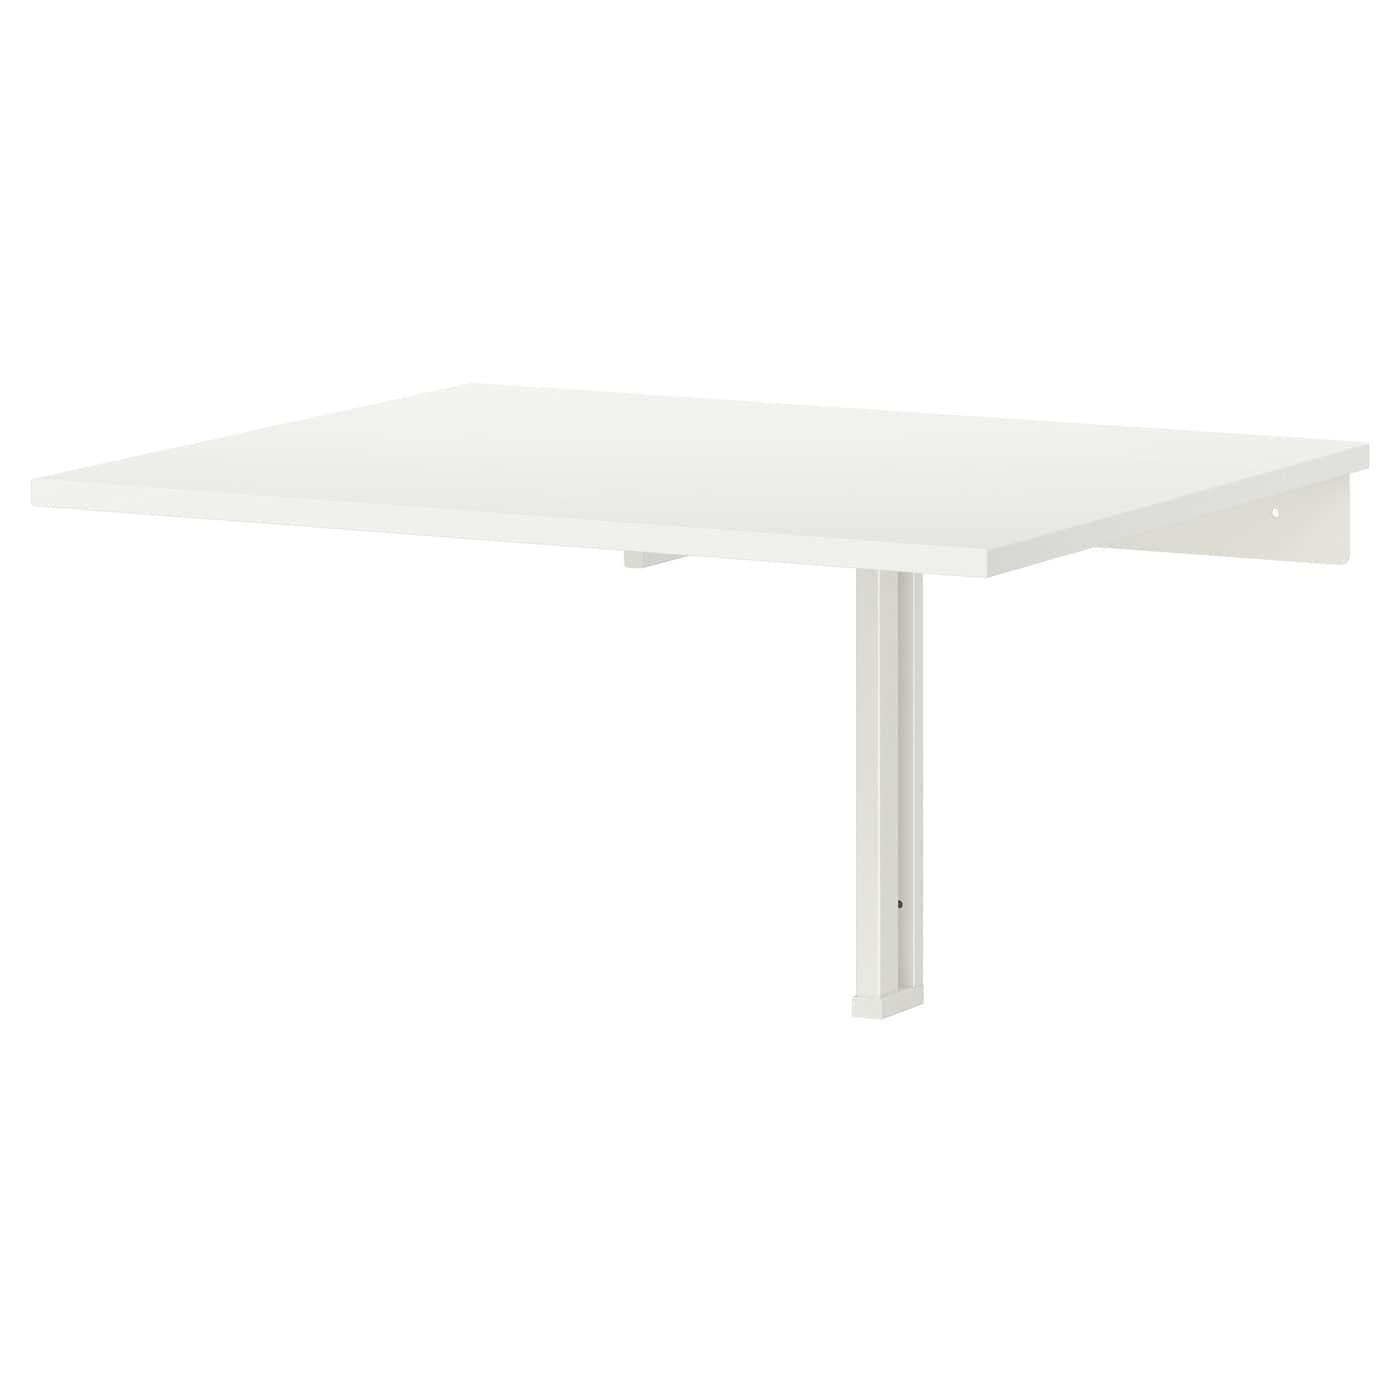 NORBERG Mesa plegable de pared Blanco 74 x 60 cm - IKEA